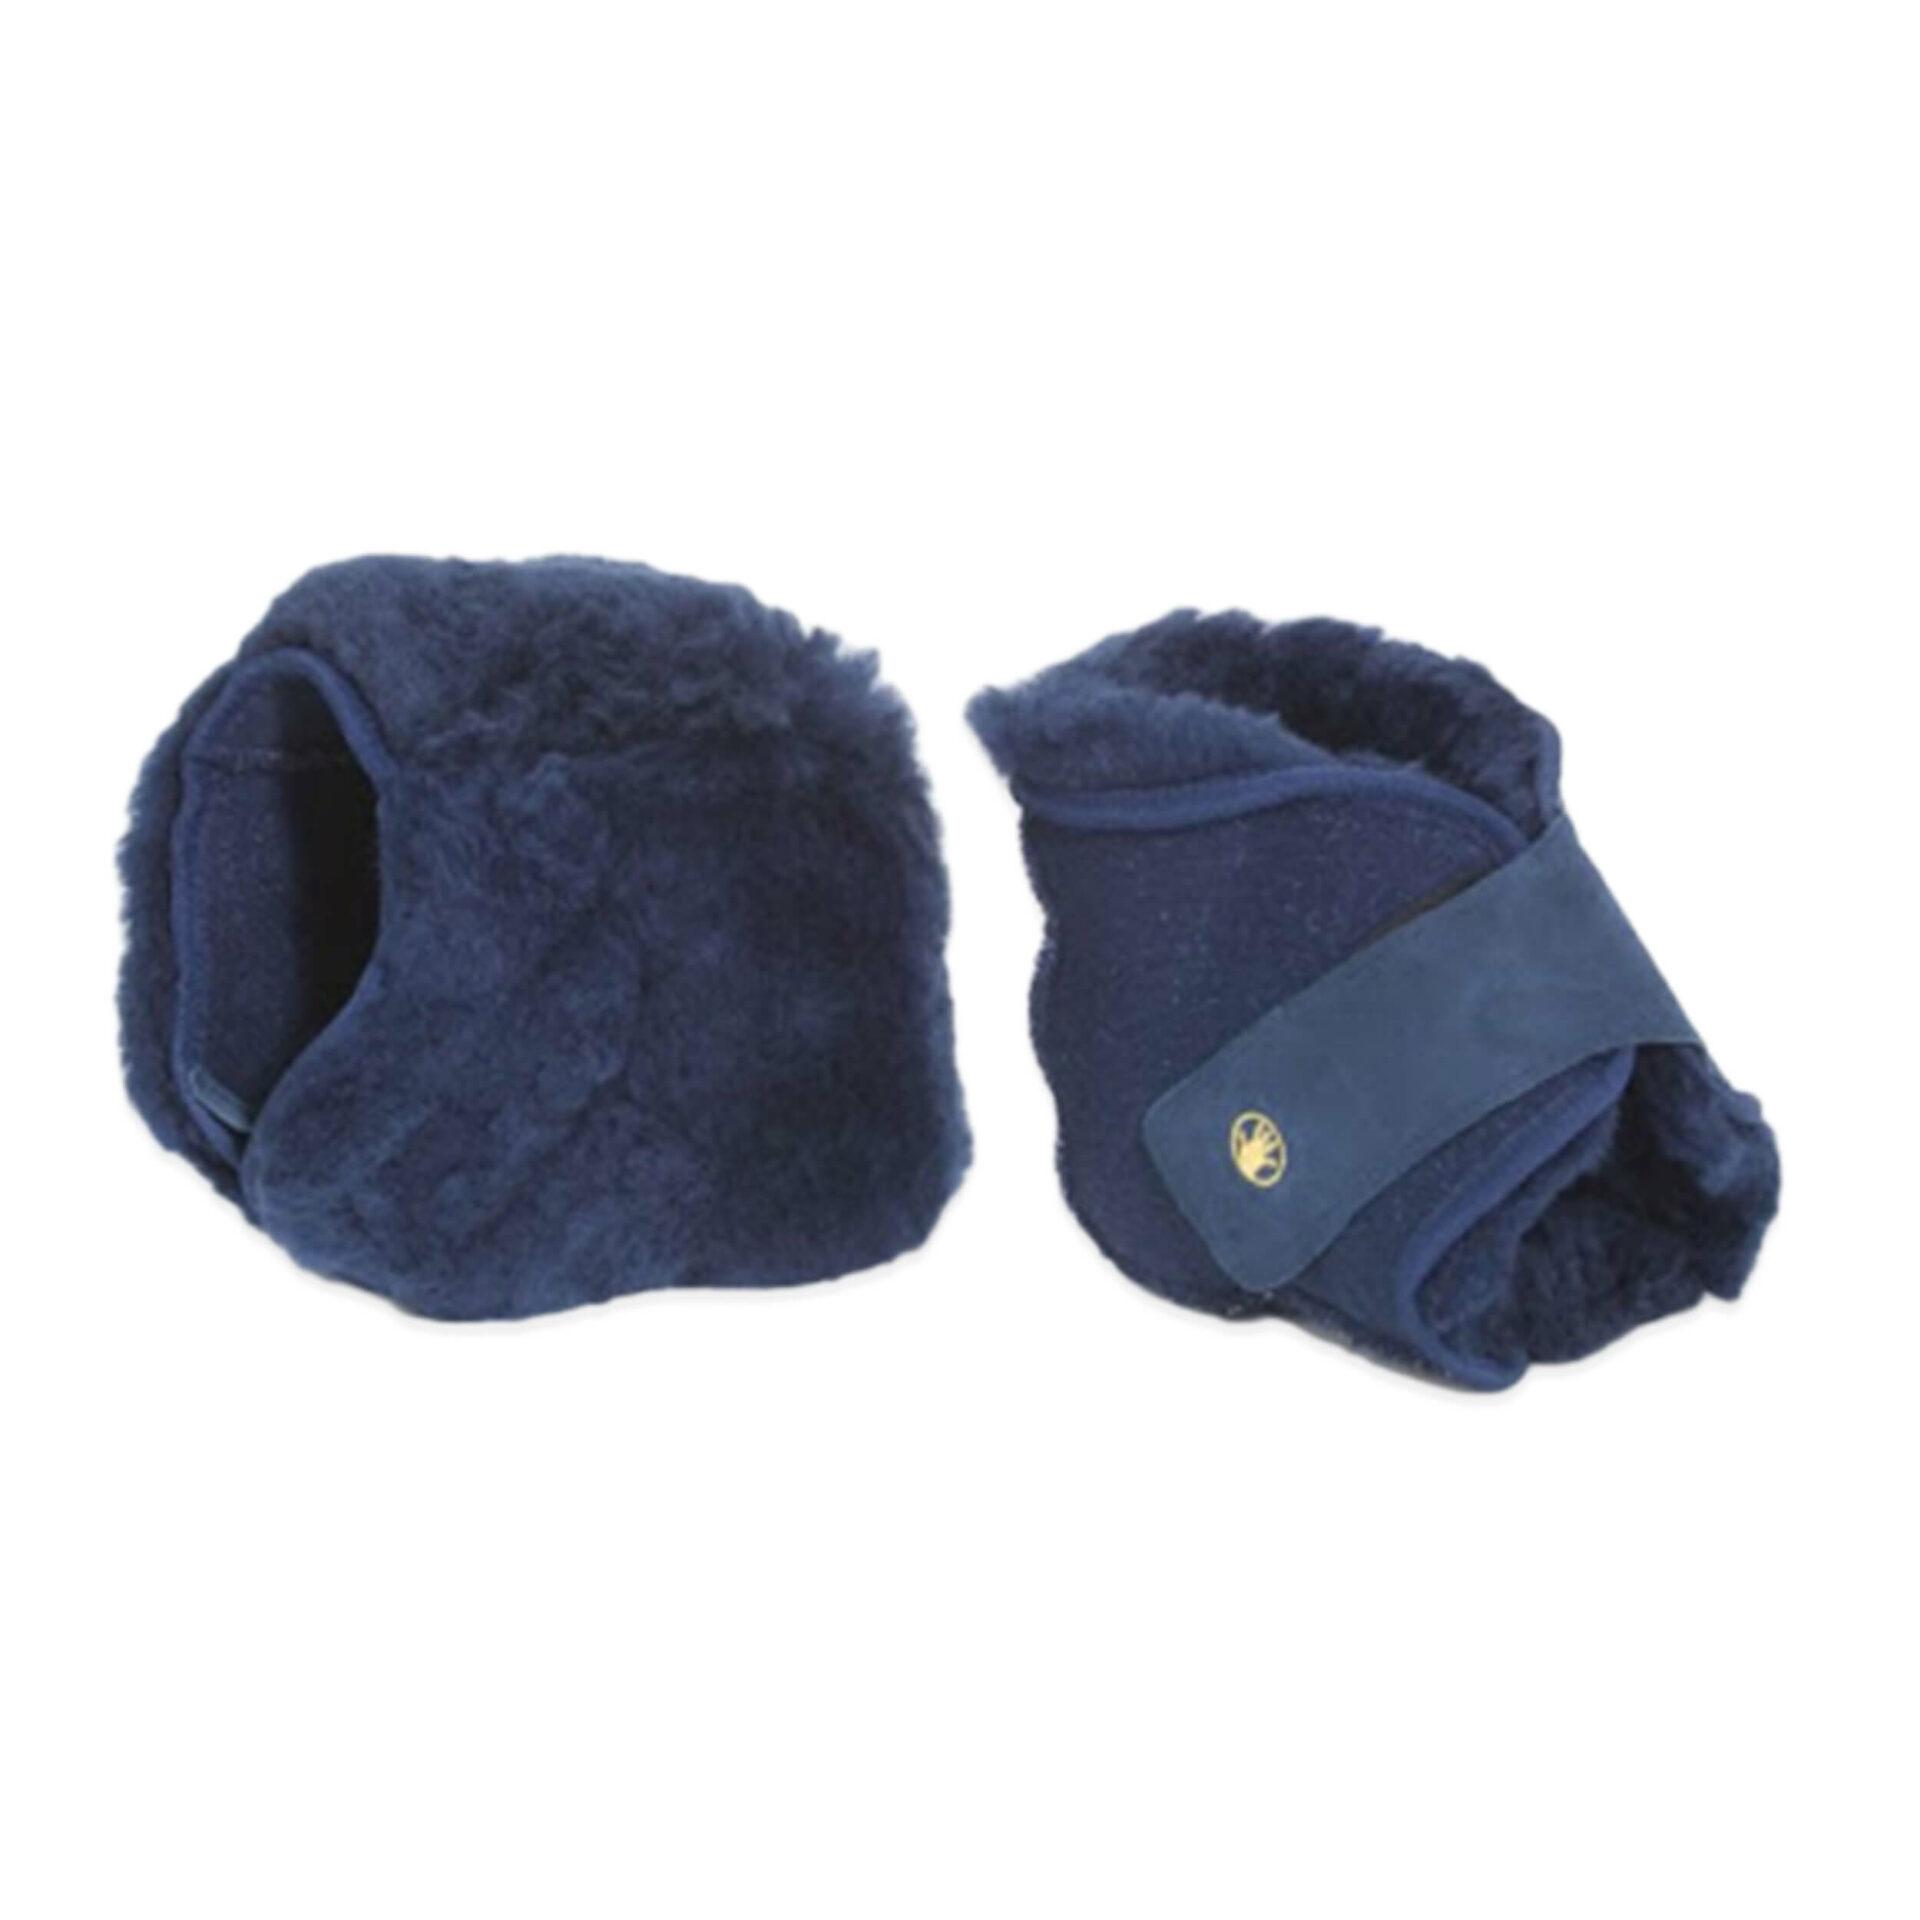 Blue Medical Sheepskin Heel Protectors